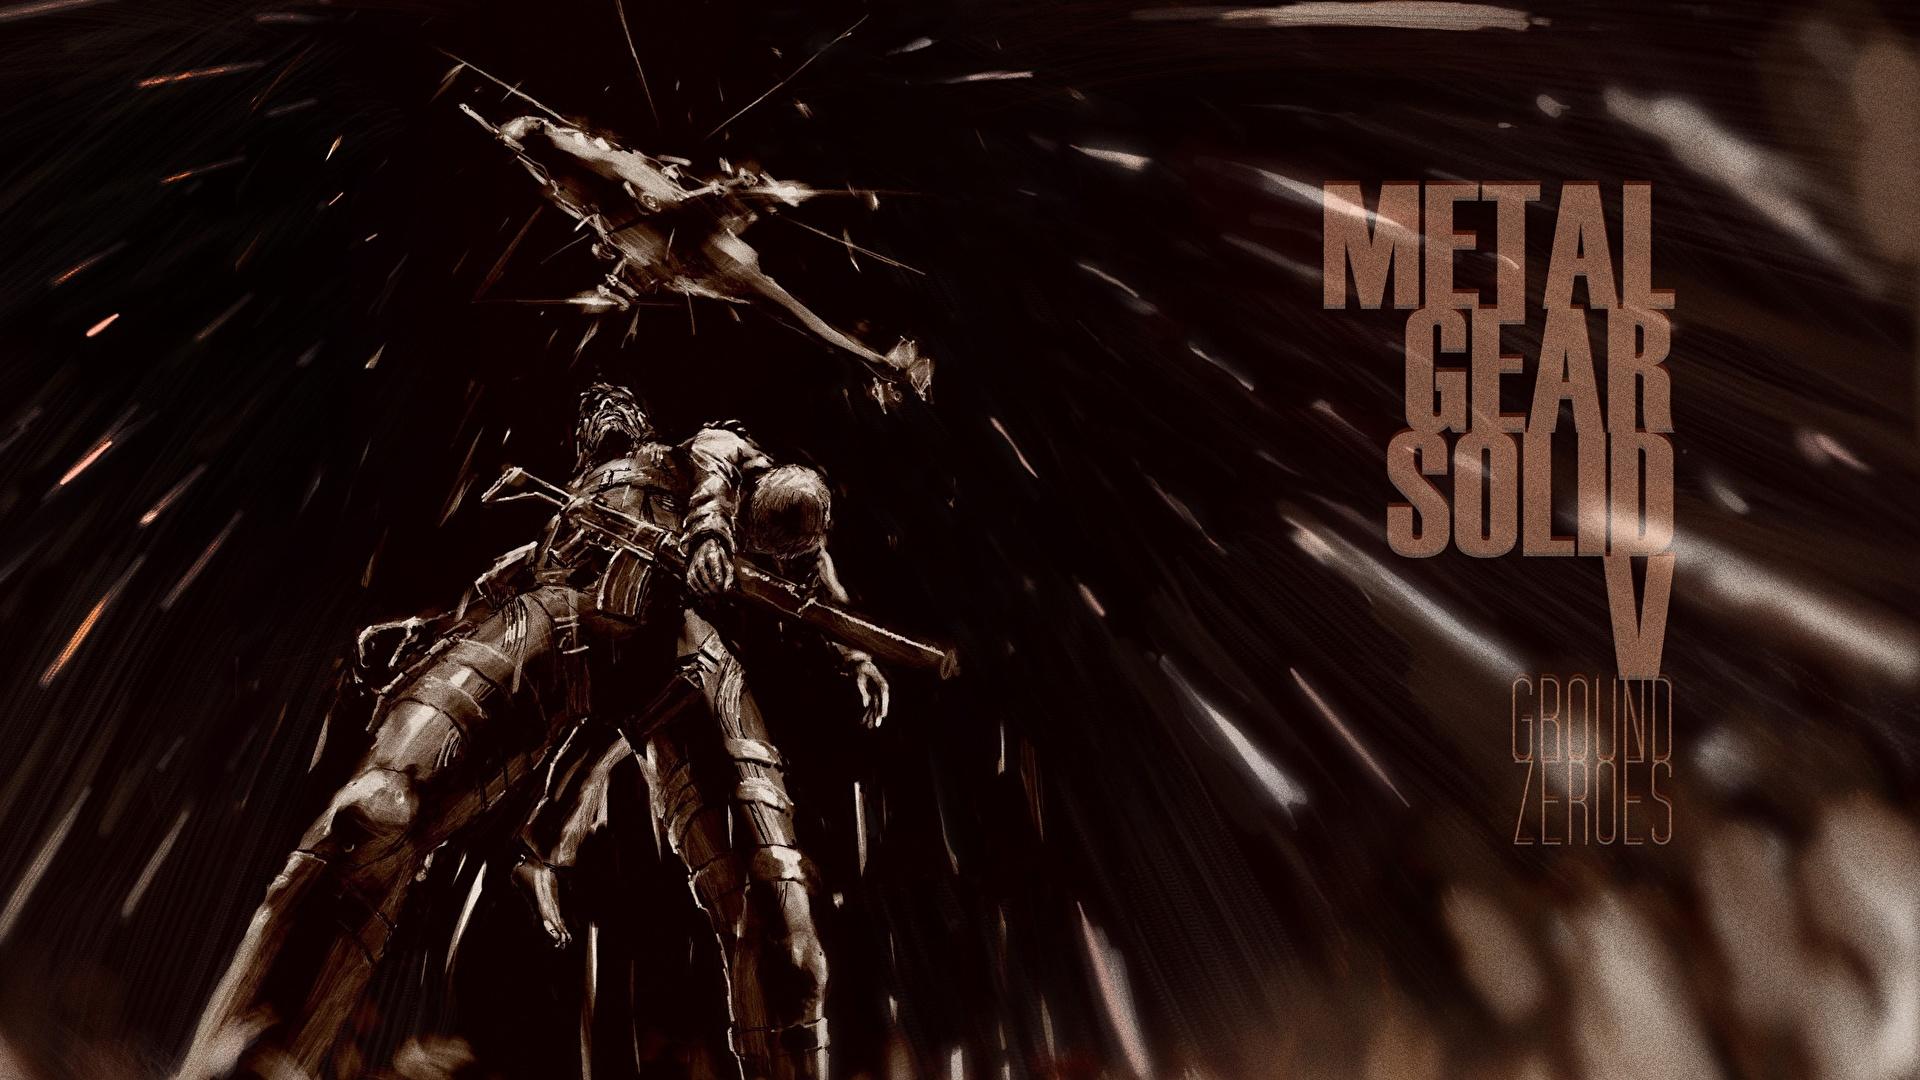 Wallpaper Metal Gear Solid V Solid Snake Games 1920x1080